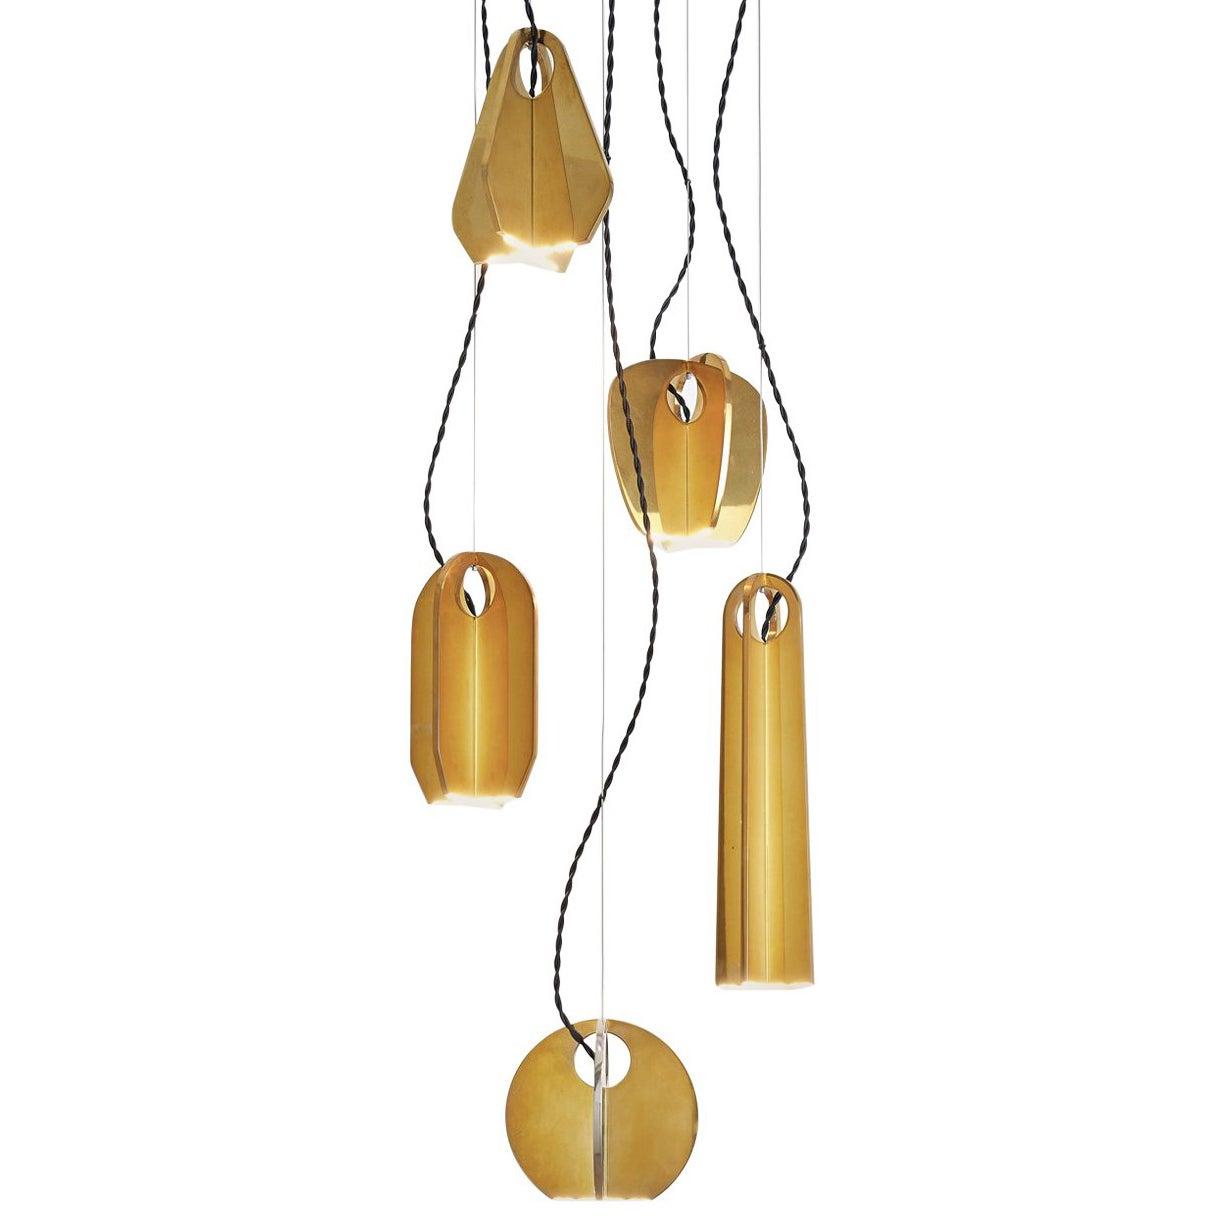 Tessere Five Lights LED Pendant / Chandelier Solid Brass Minimal light fixtures